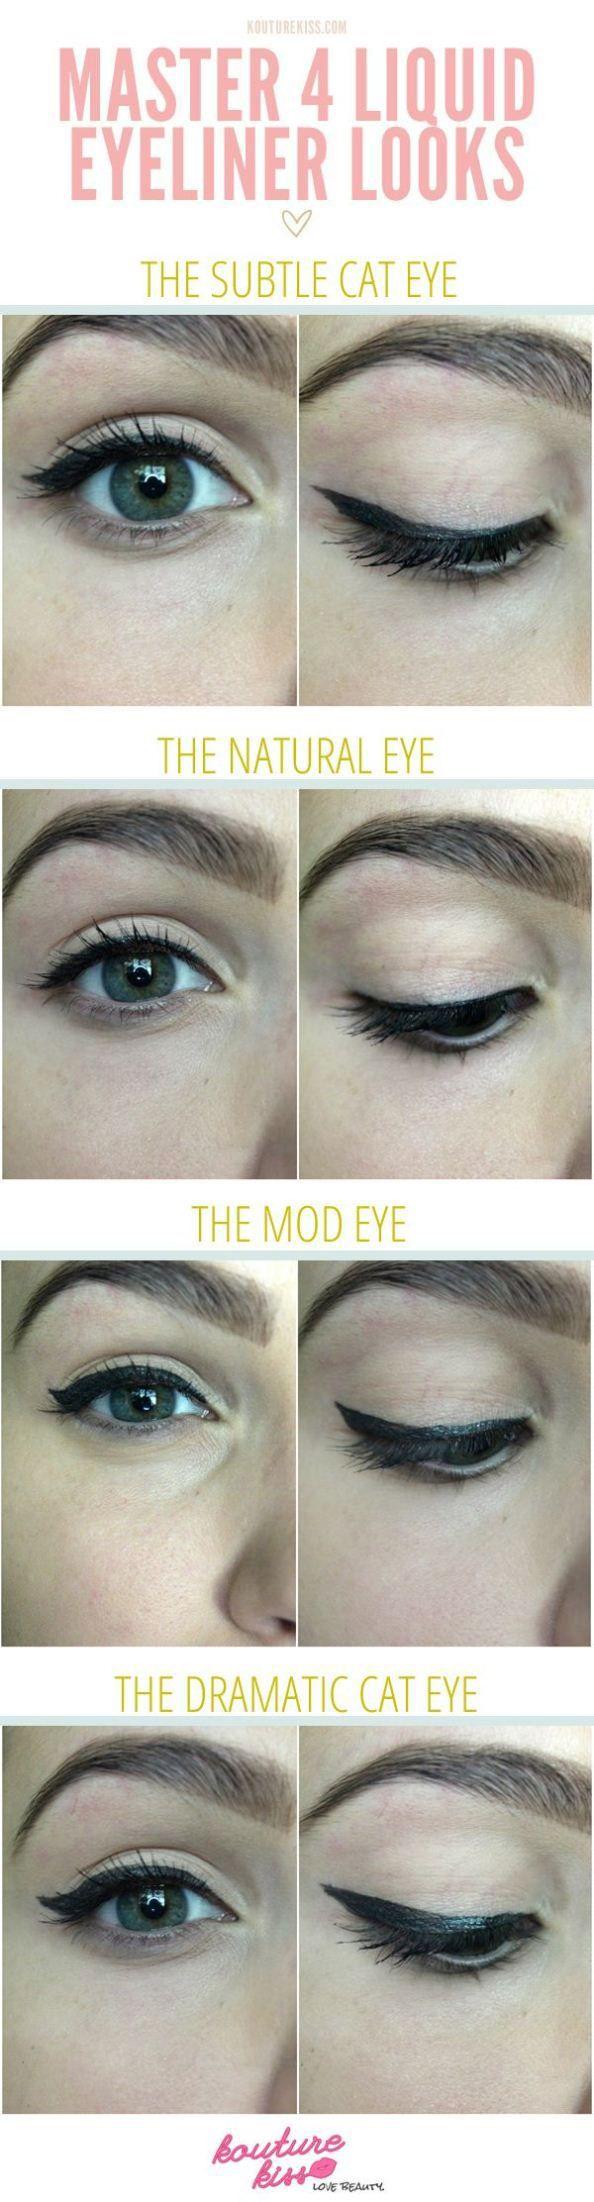 how to use cat eye eyeliner